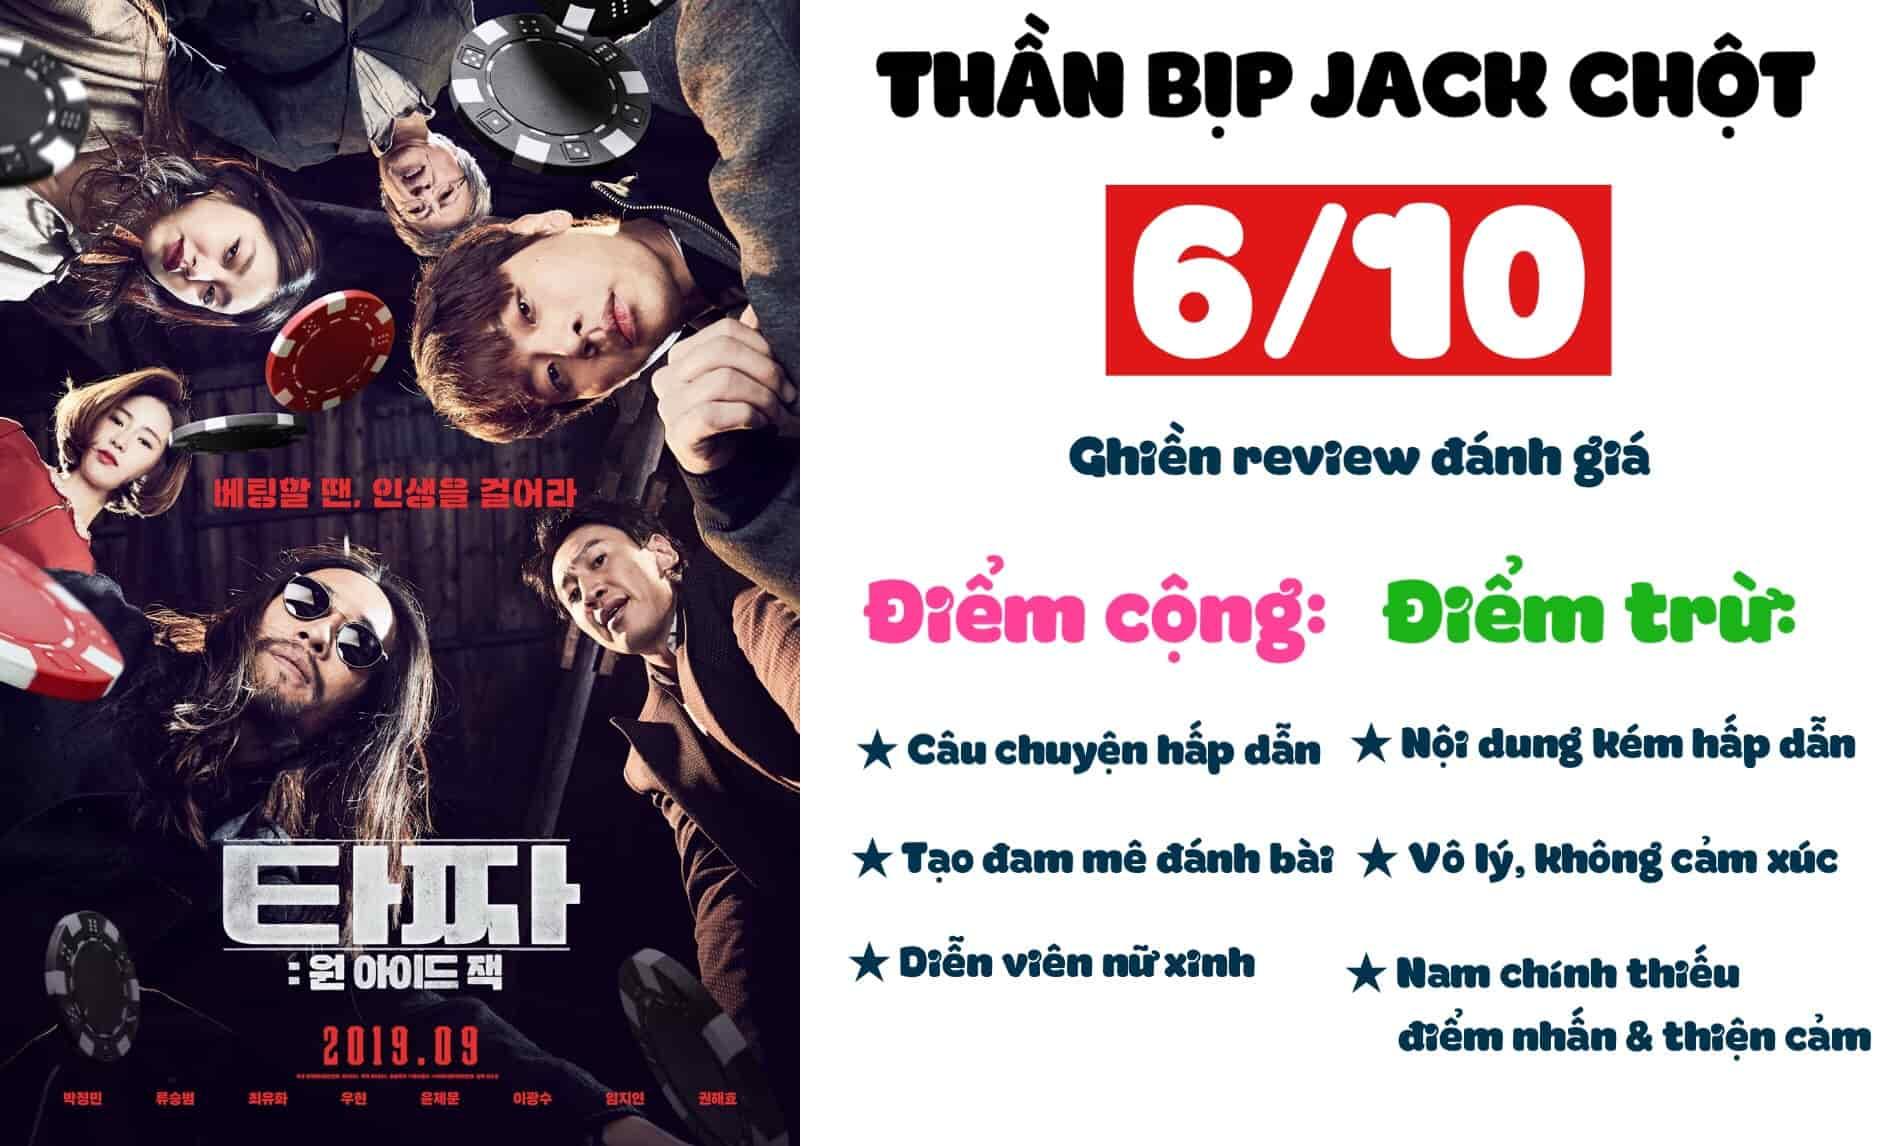 Ghien review - Than bip jack chot